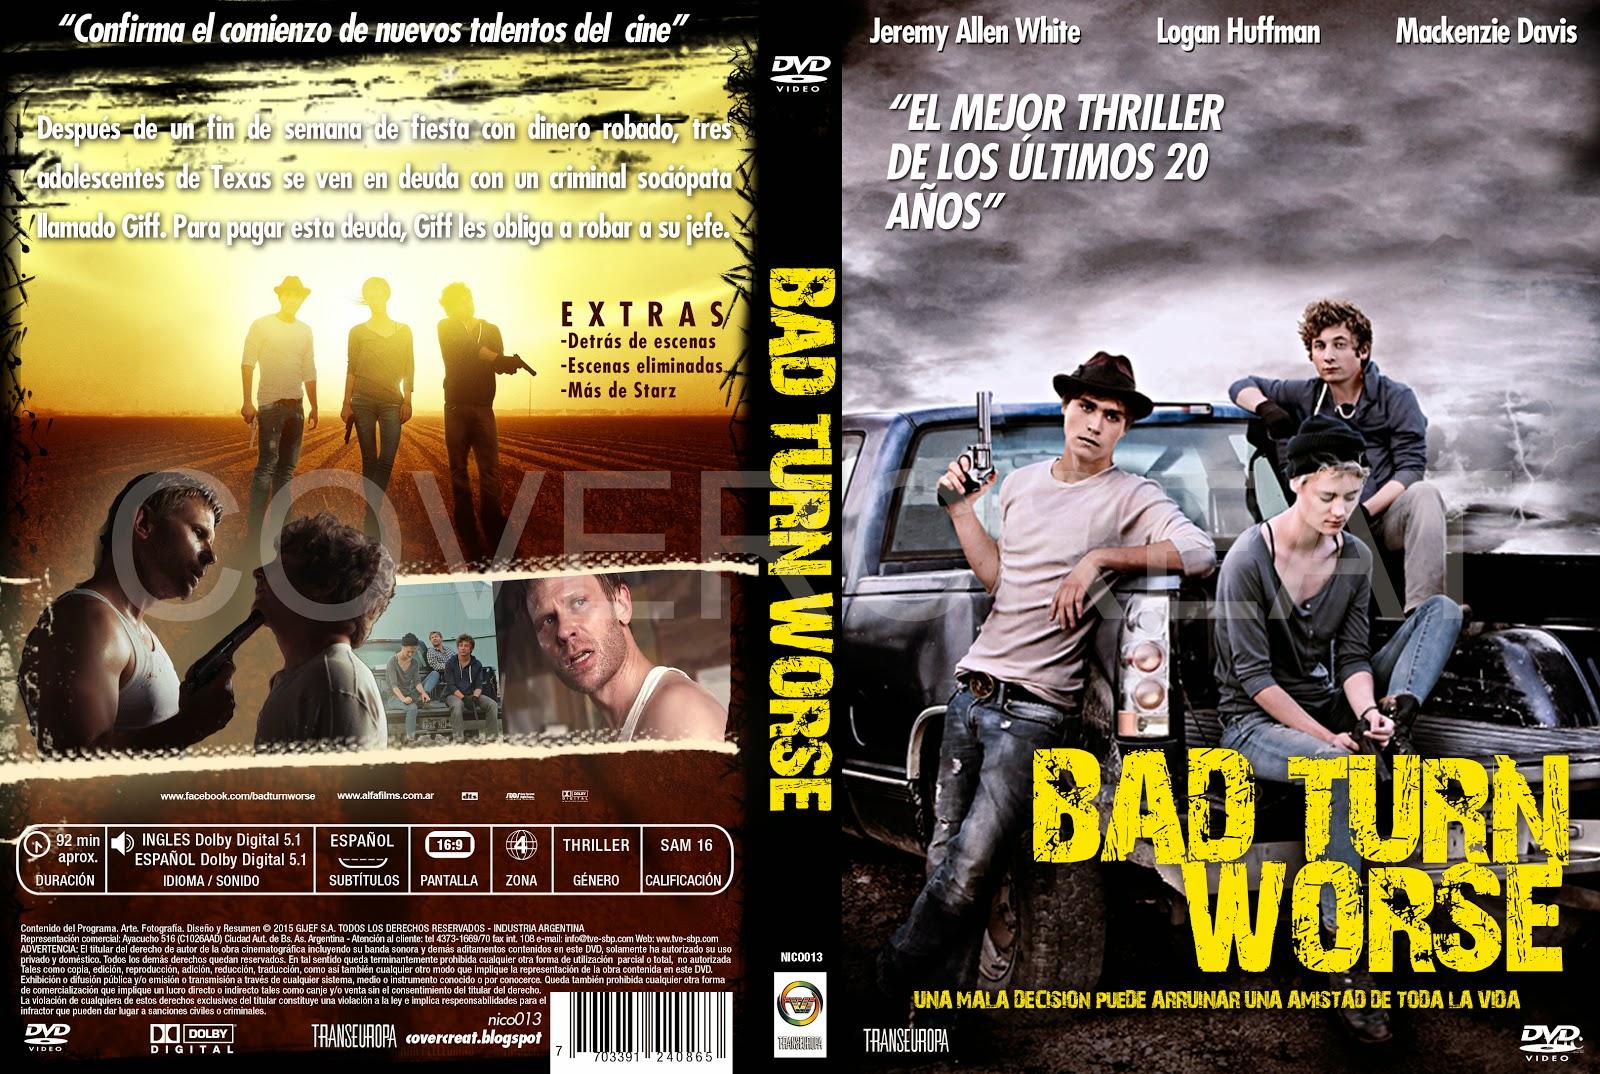 covercaratulas de dvd cd covercreators bad turn worse dvd cover cd 2014. Black Bedroom Furniture Sets. Home Design Ideas